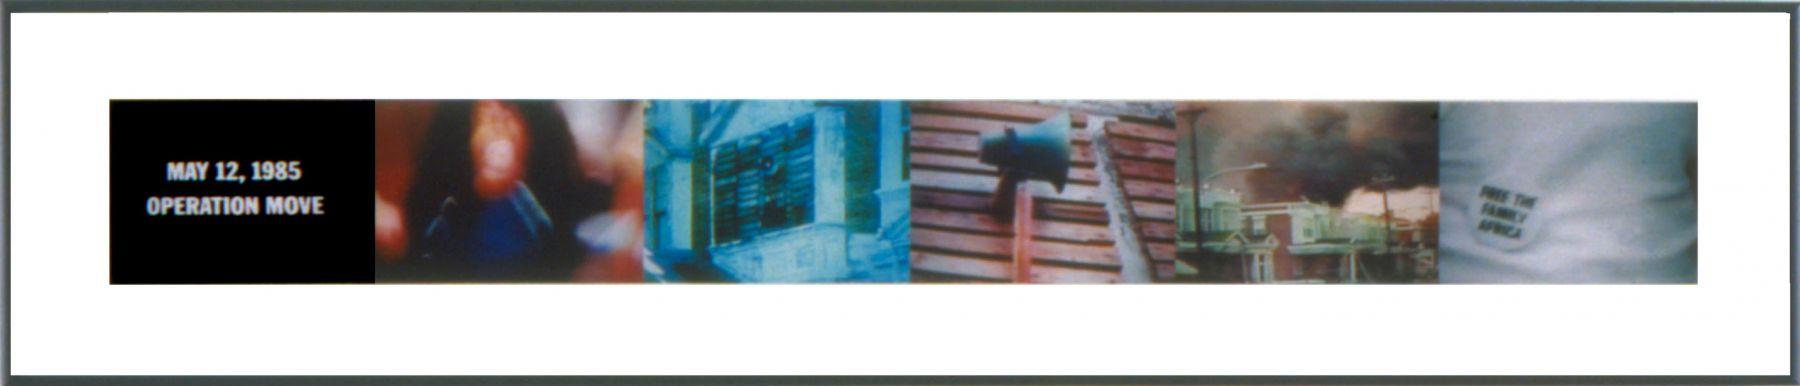 True Crime #5, 2006, 5 C-prints